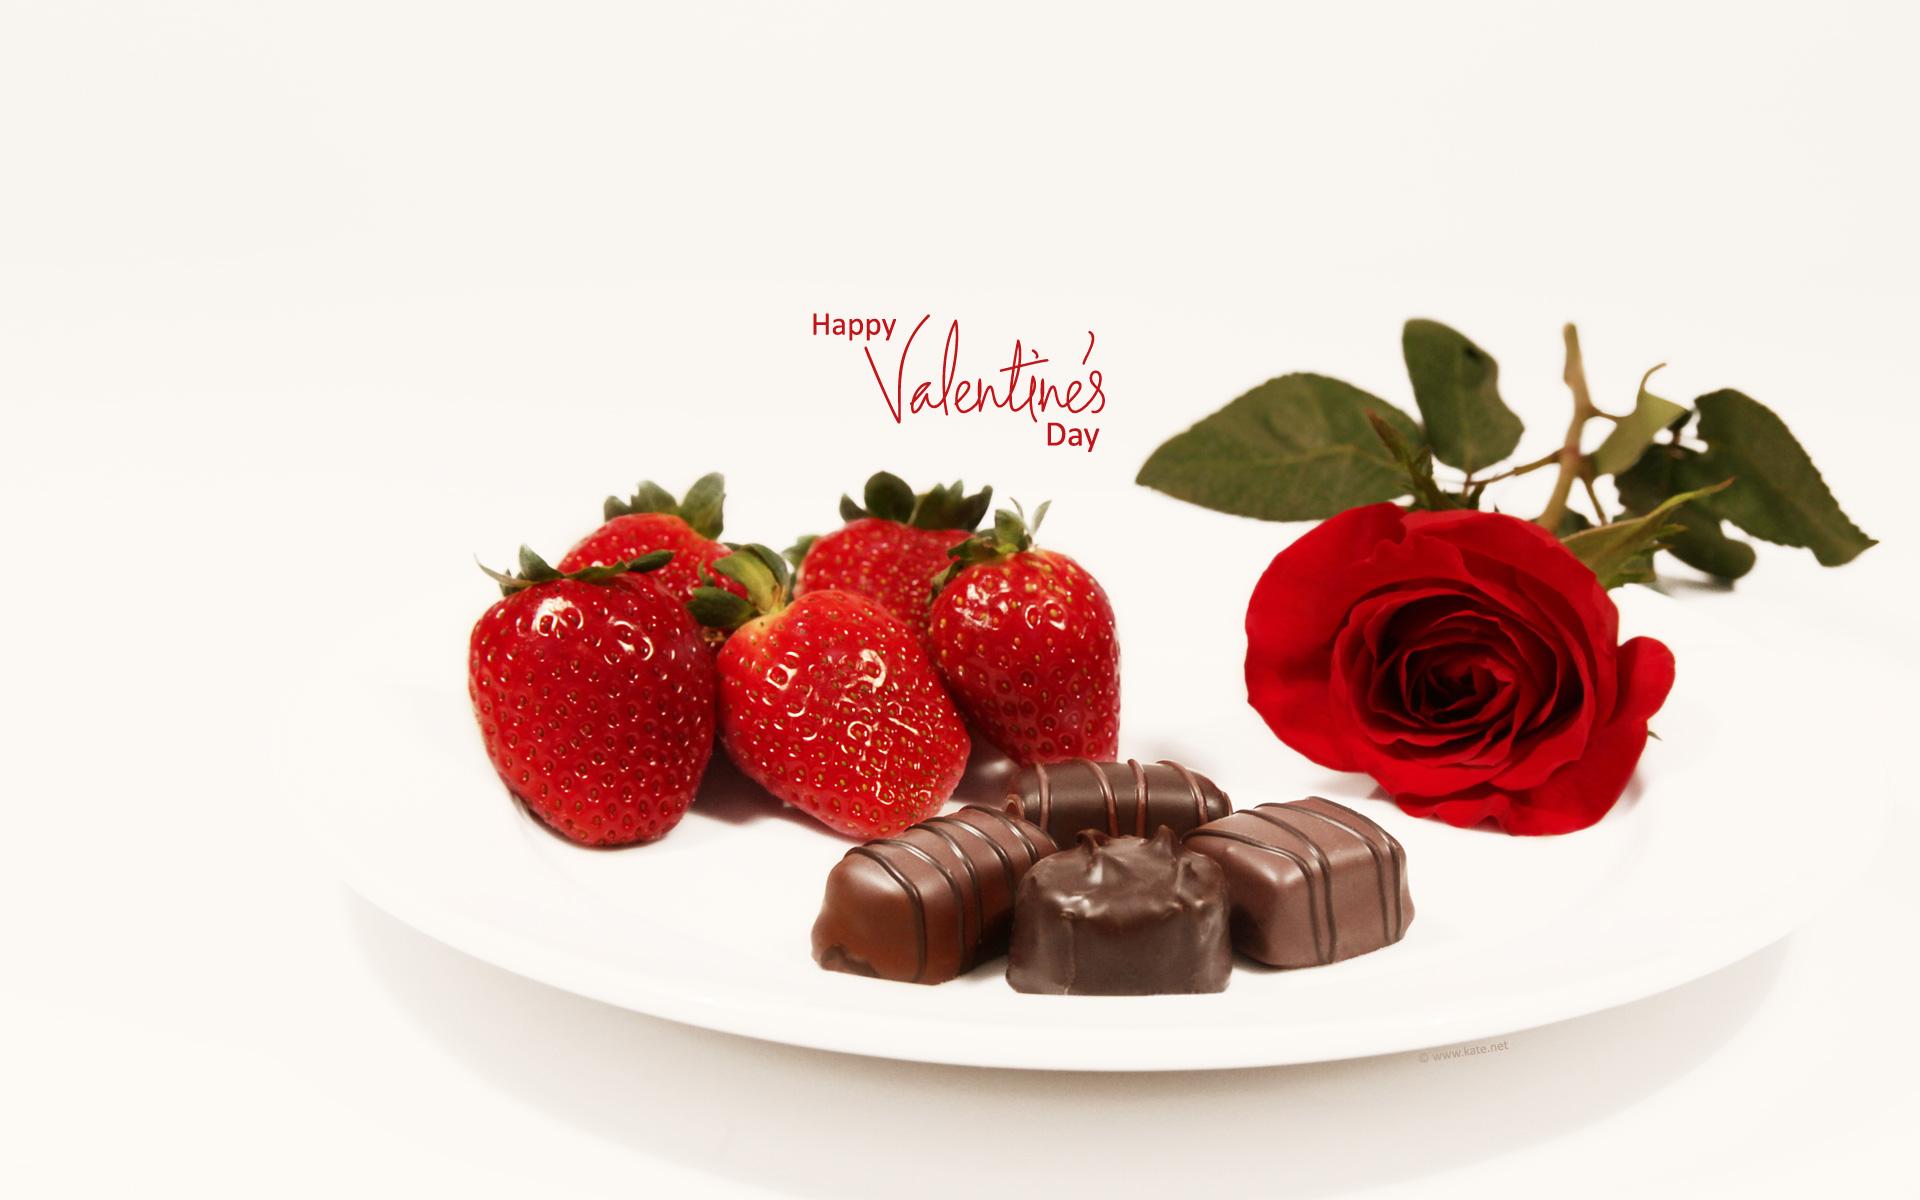 Happy Valentines Day wallpaper   984828 1920x1200